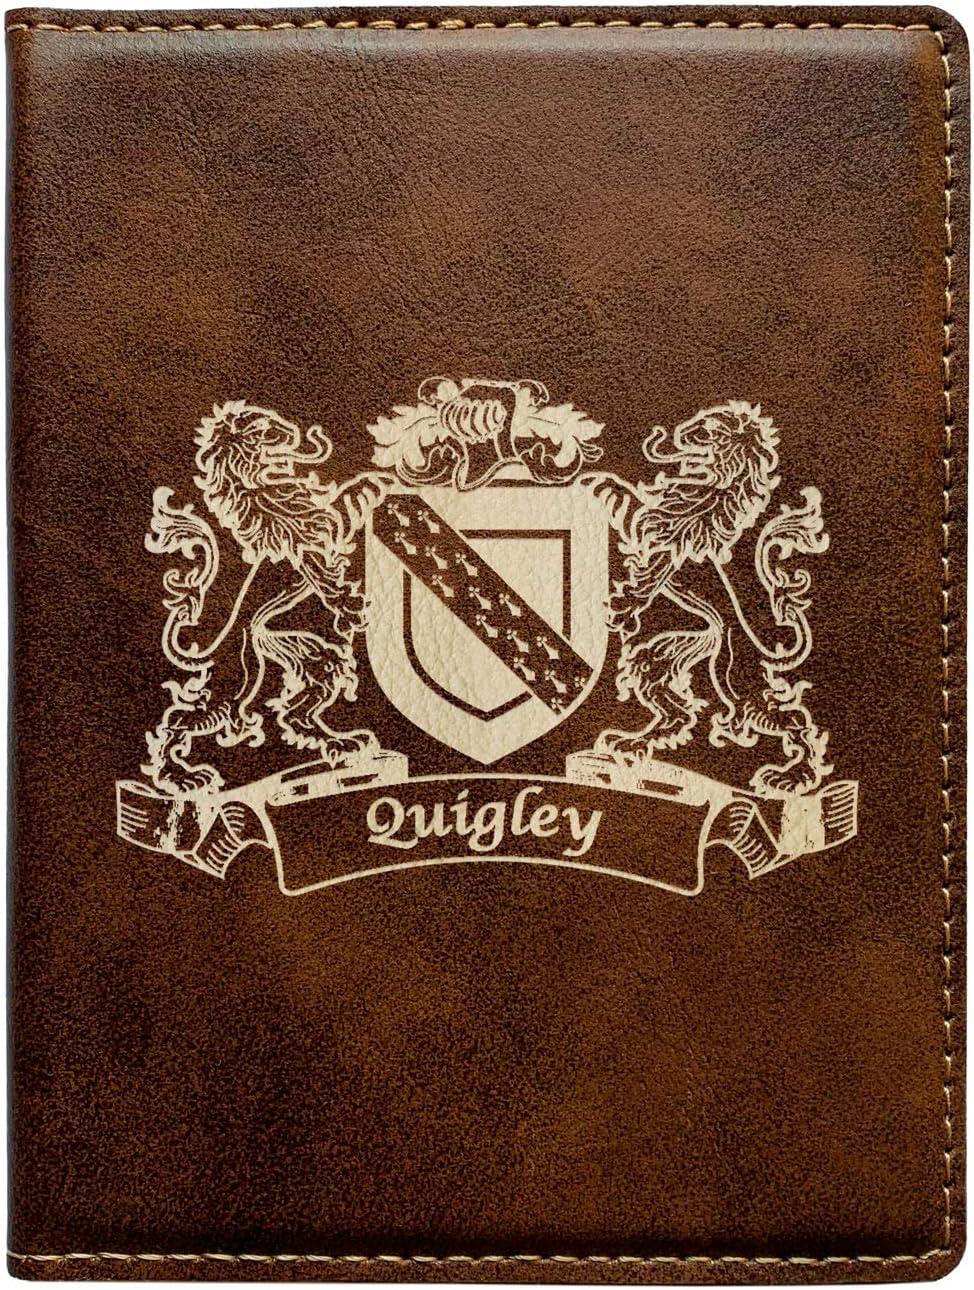 Quigley Irish Coat of Arms Leather Passport Wallet